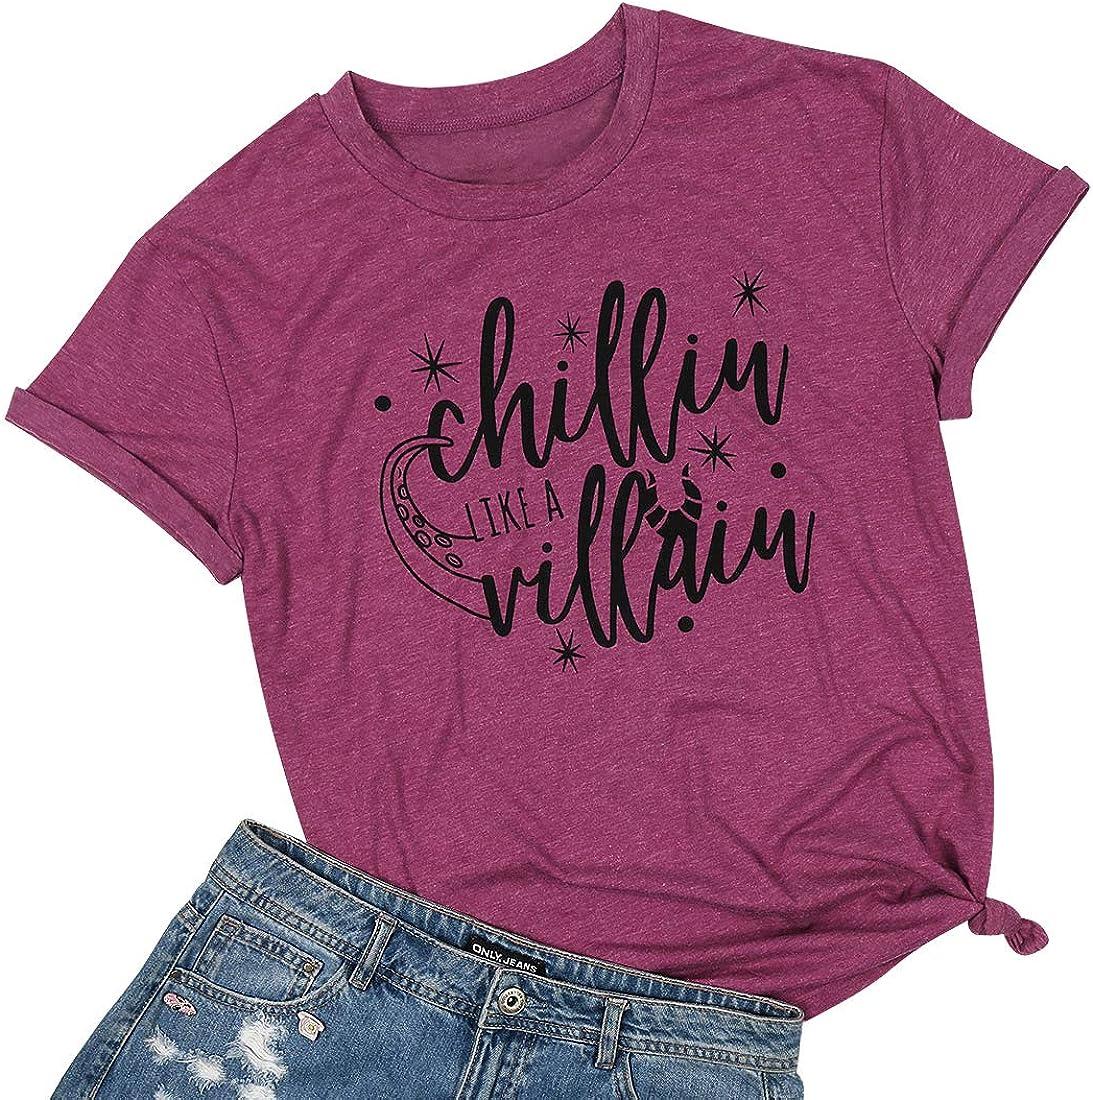 KNEYATTA Women Chillin Like a Villain Tshirts Funny Letter Print Tee Tops Casual Short Sleeve Shirts Top